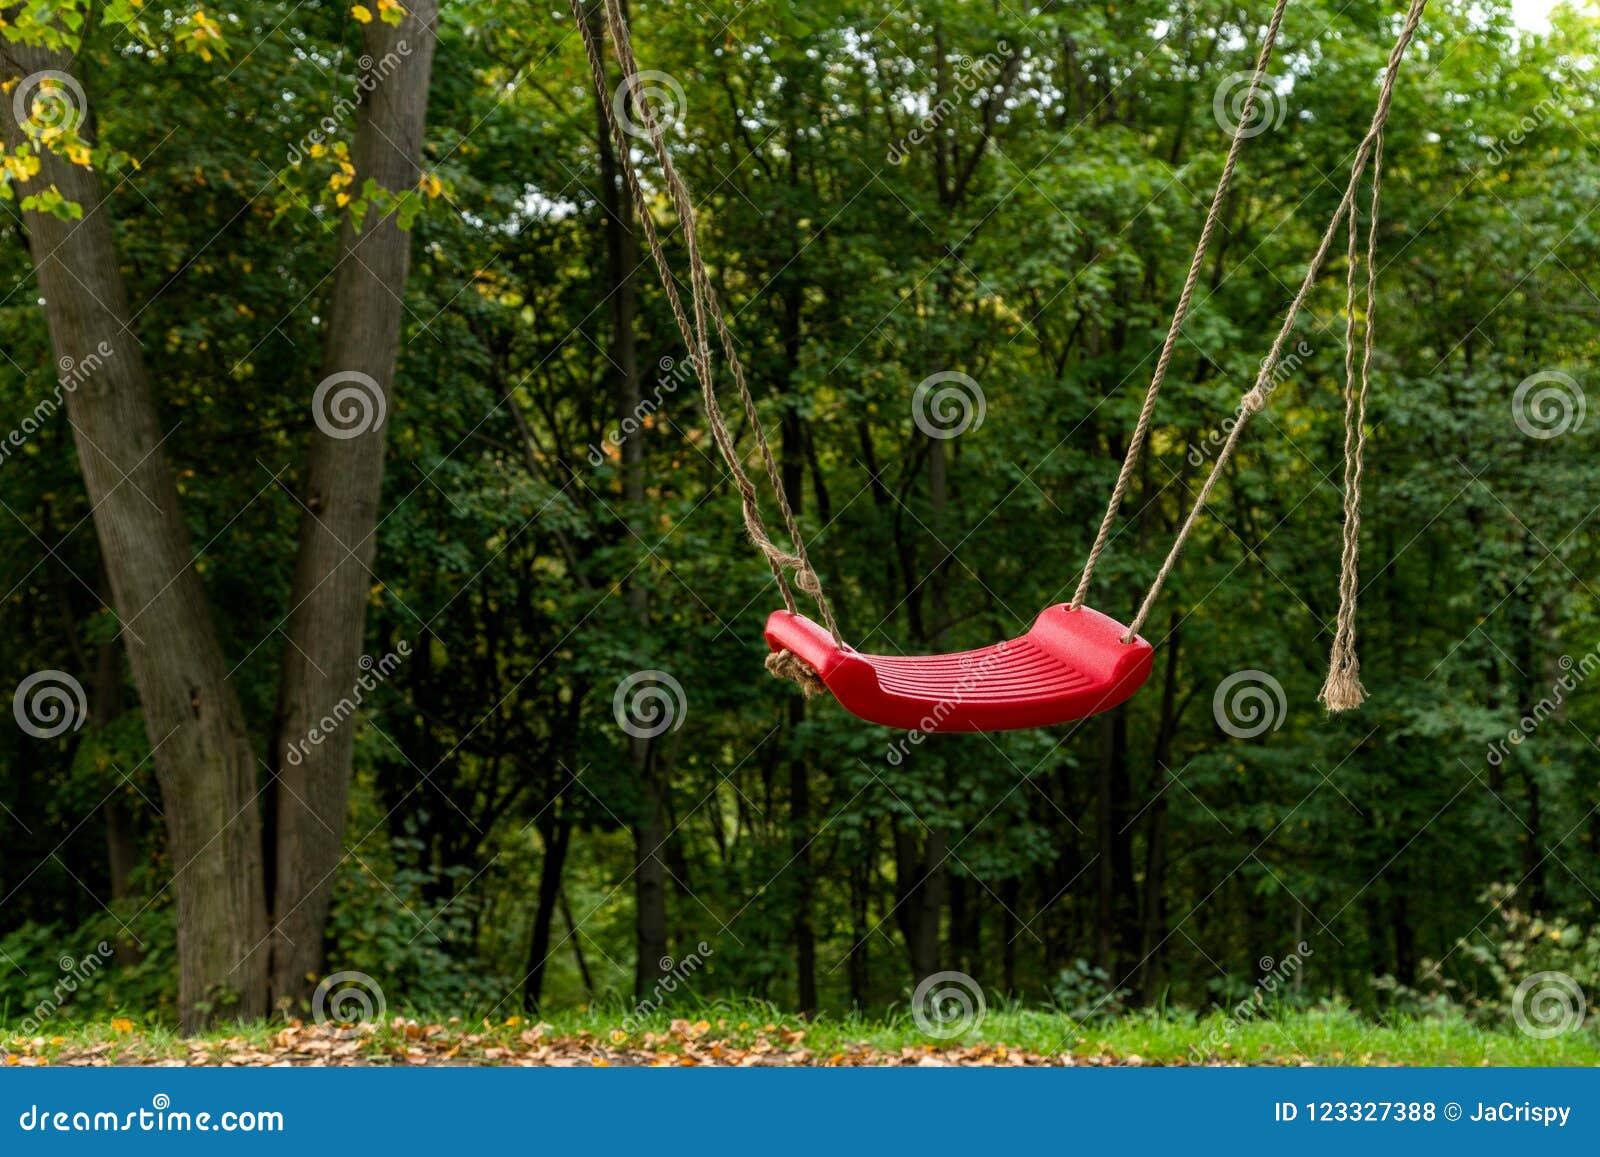 Red Swings In Between Two Trees In The Woods Fun Outdoor